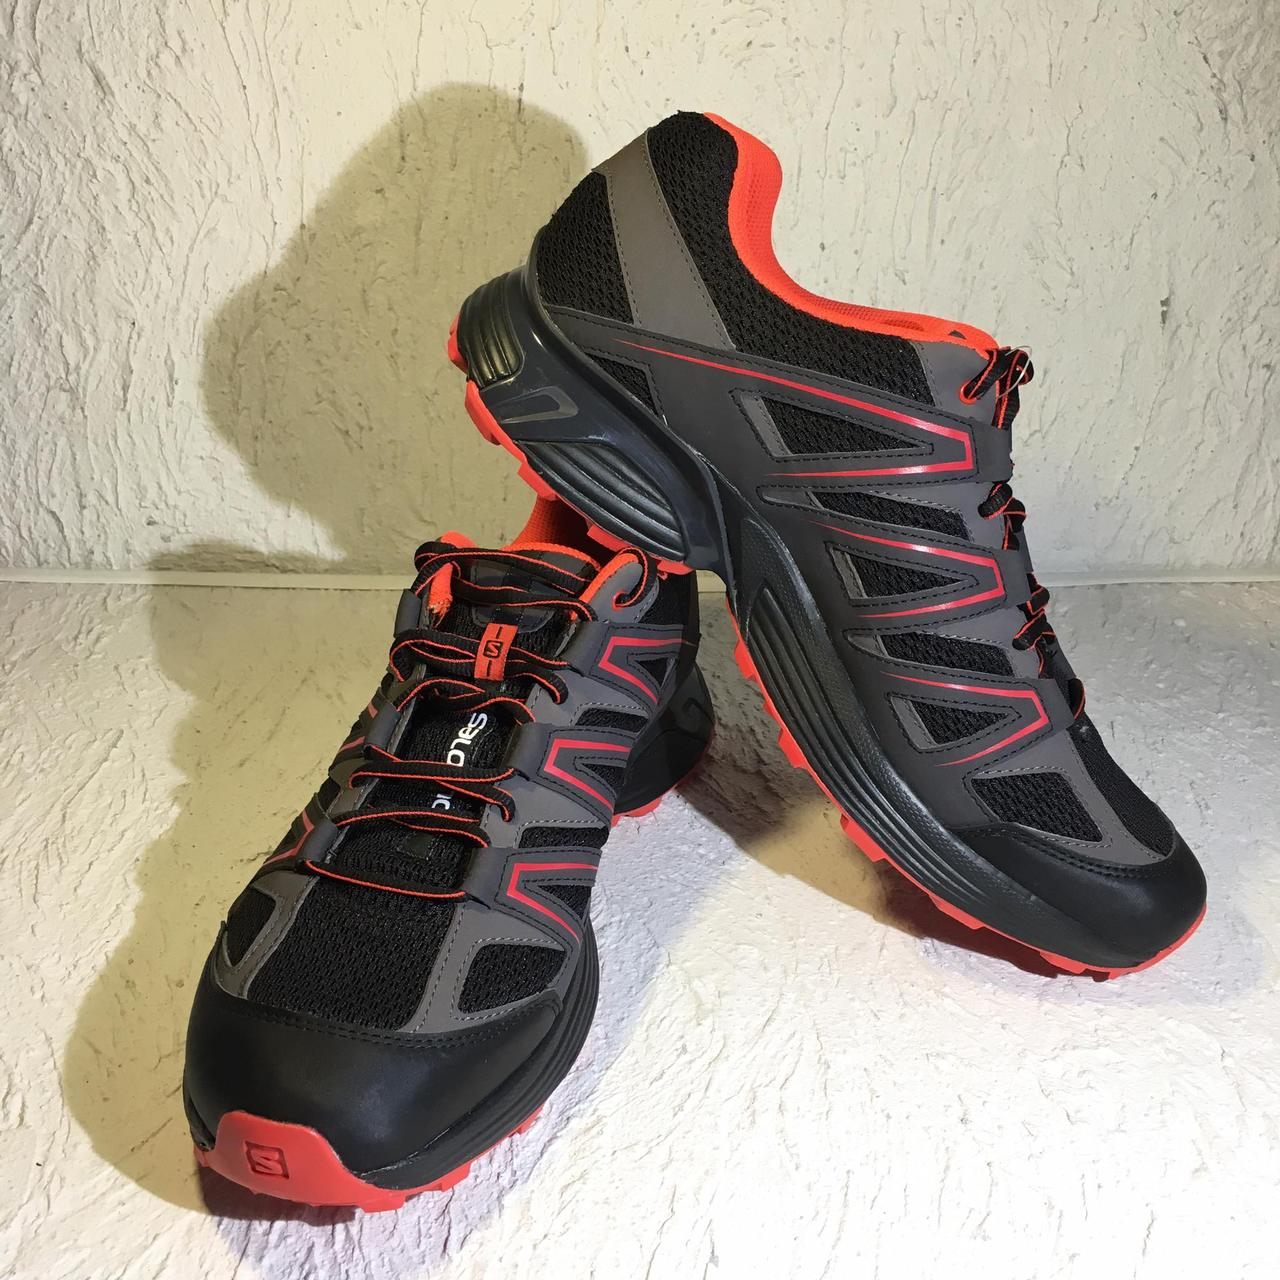 Кроссовки Salomon XT Bindarri Trail Outdoor 382121 45.5, 46 размер